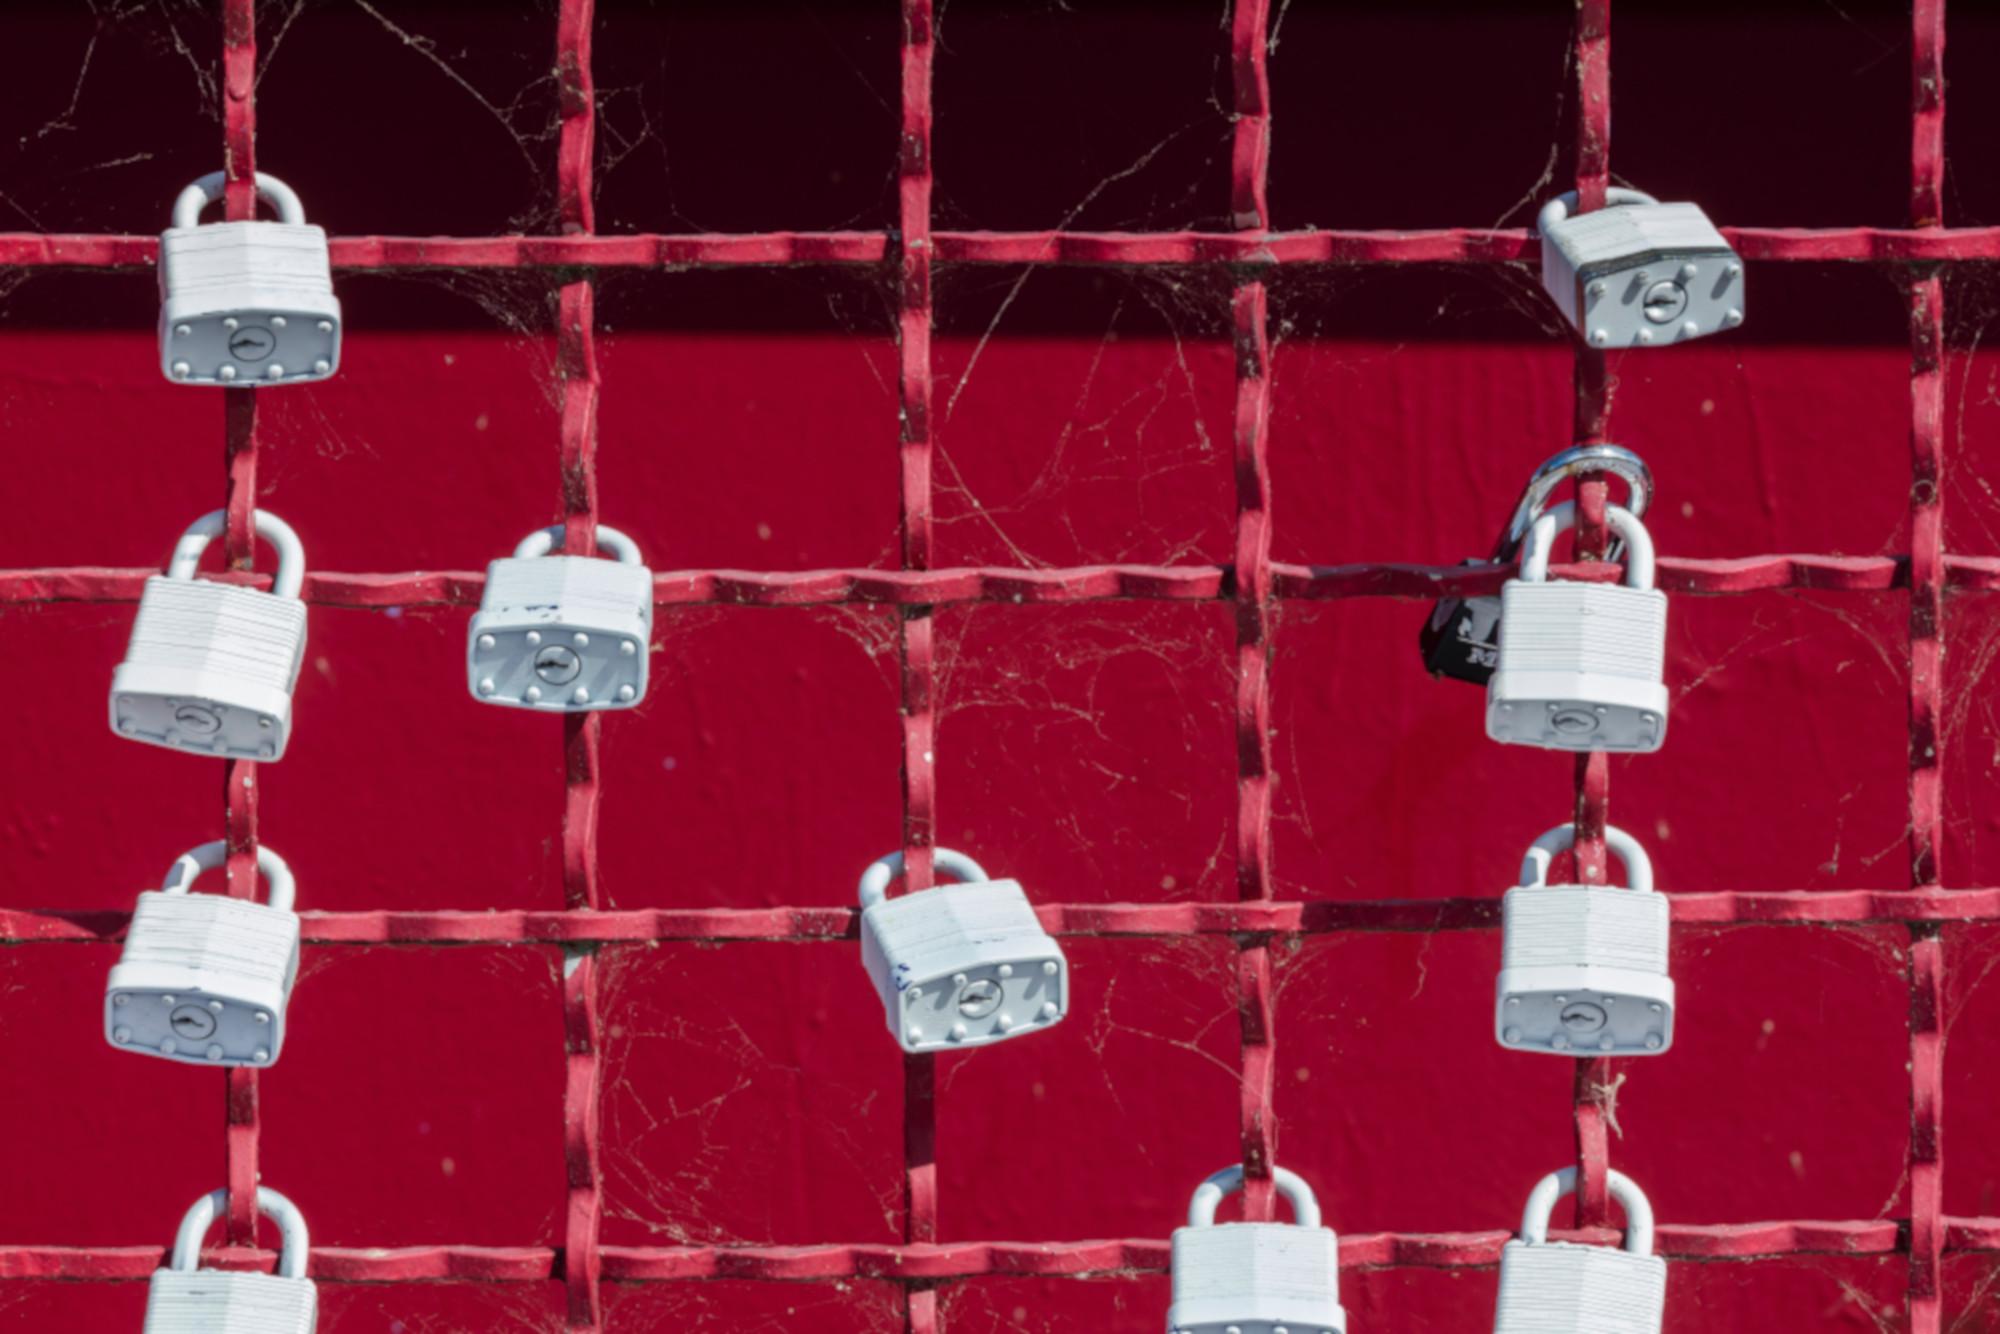 Iot e cyber securityrid